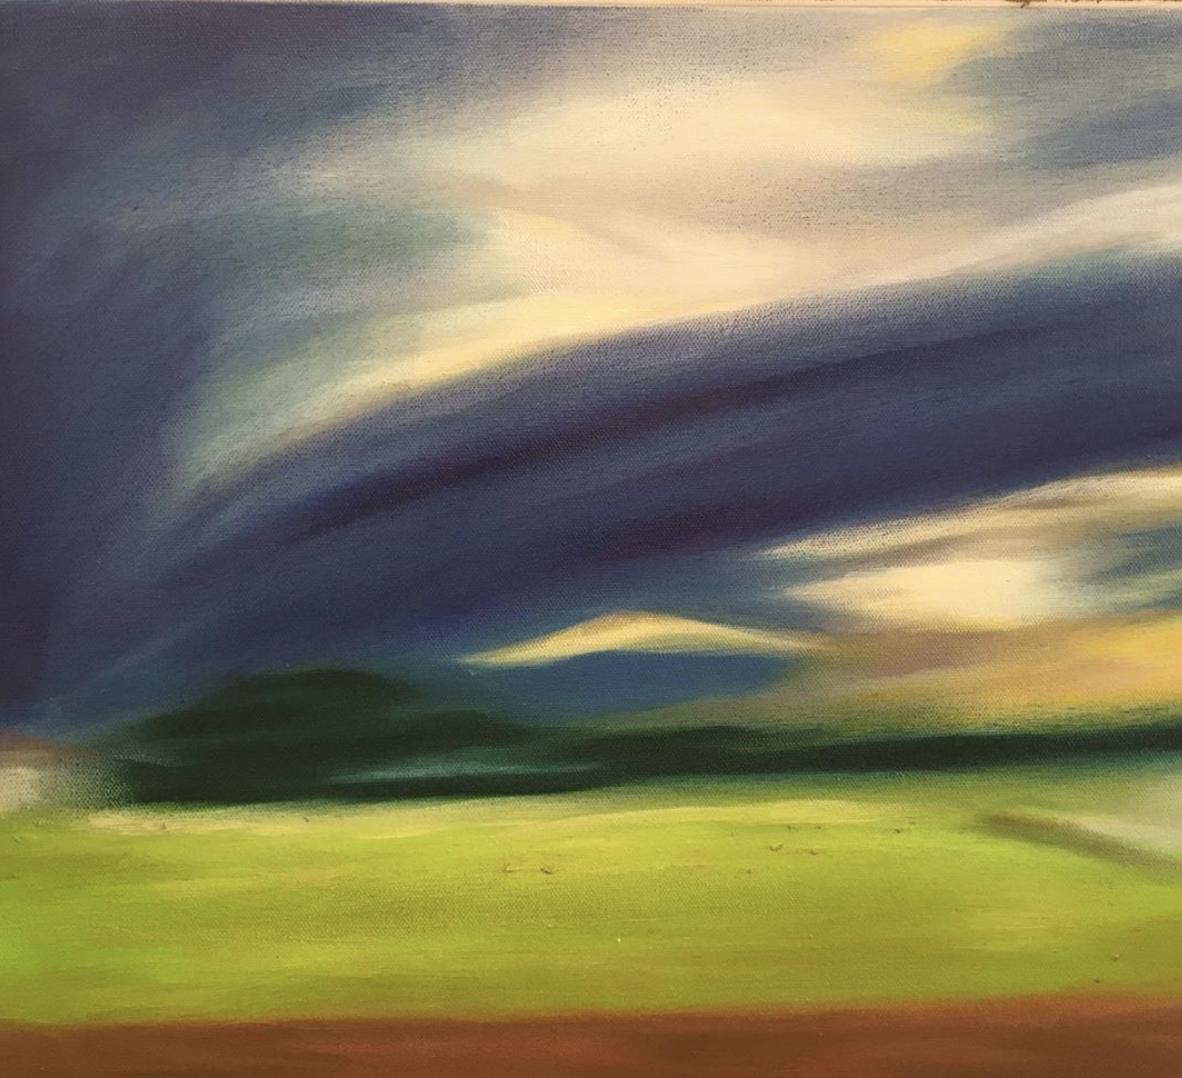 Blurred Storm